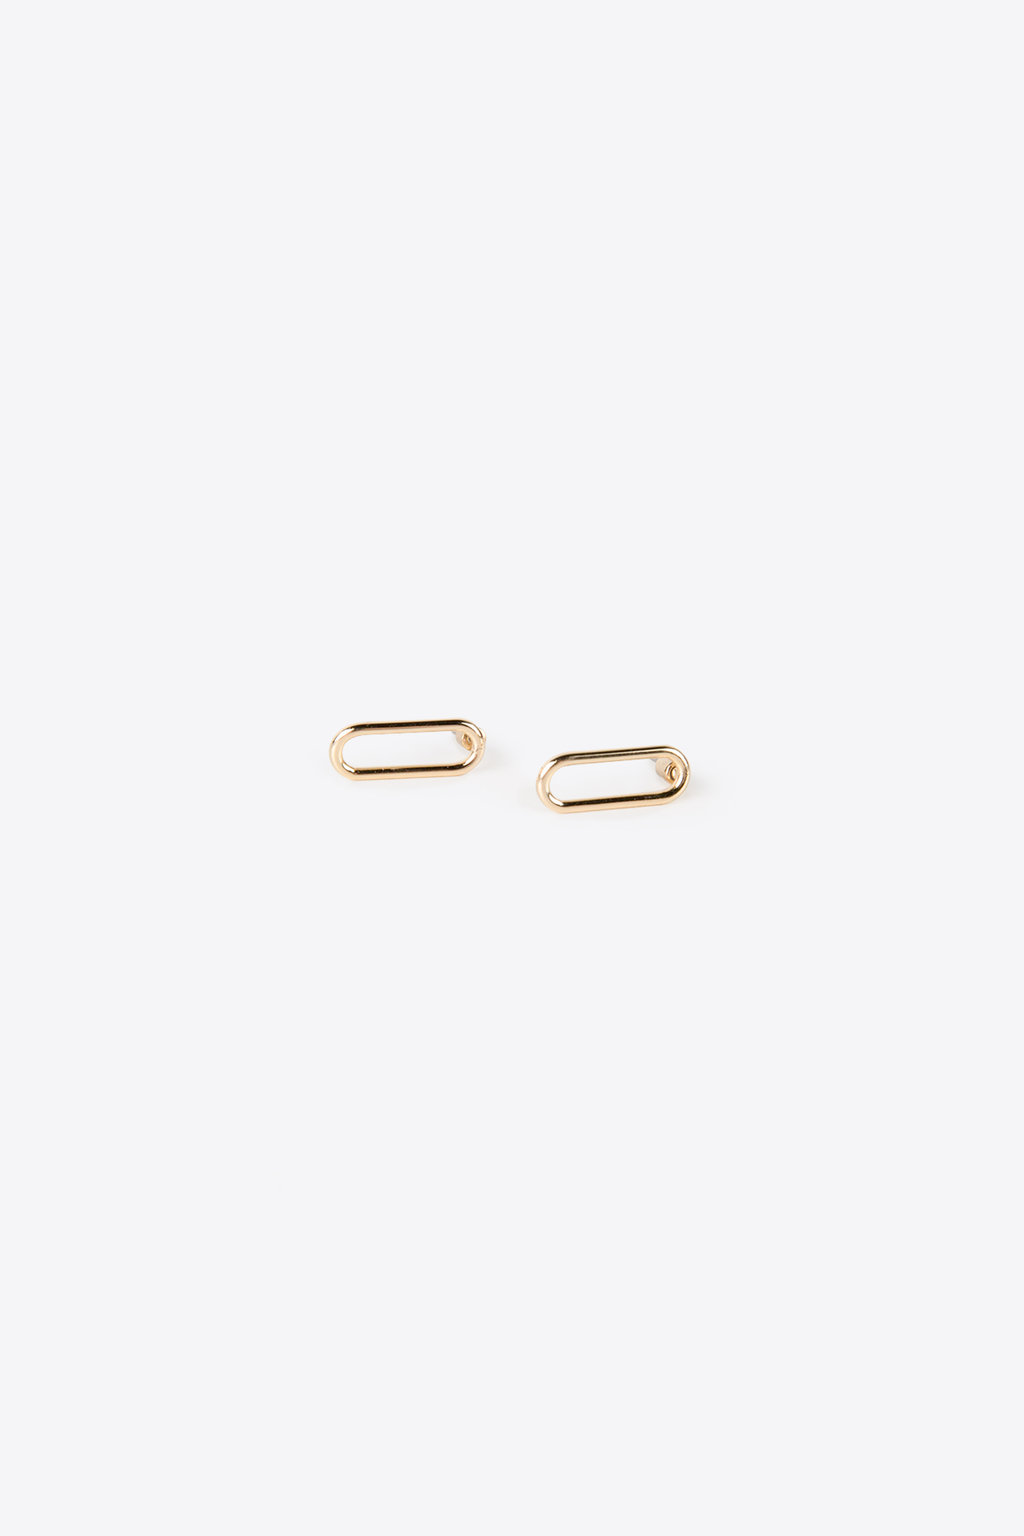 Earring 1582 Gold 3